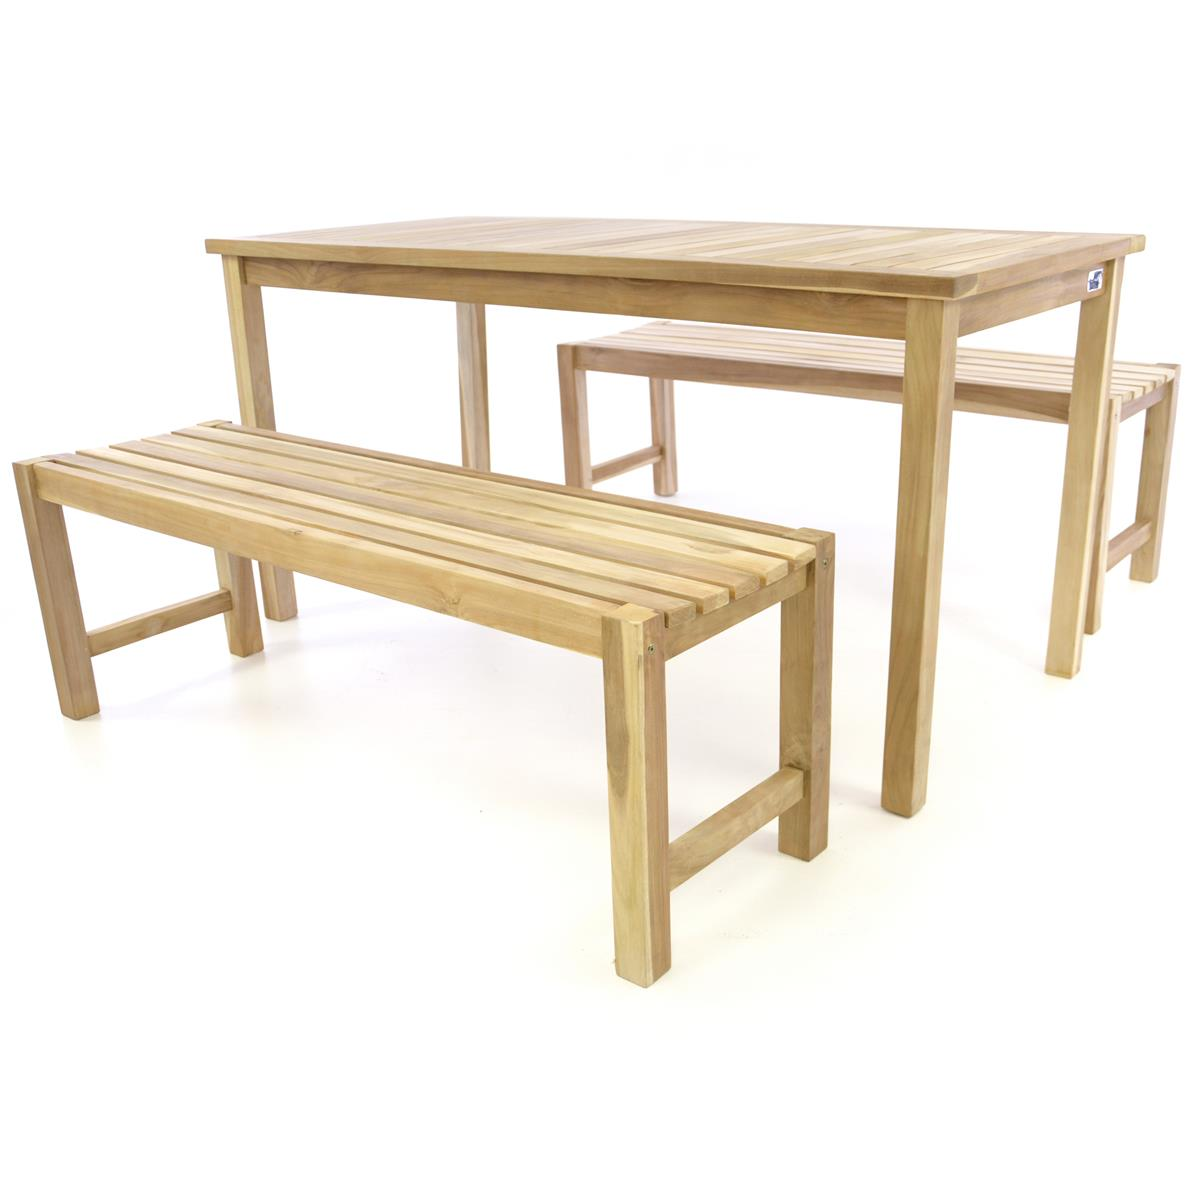 DIVERO Gartenmöbelset Picknickset Sitzgruppe natur Teakholz Bank Tisch 150cm